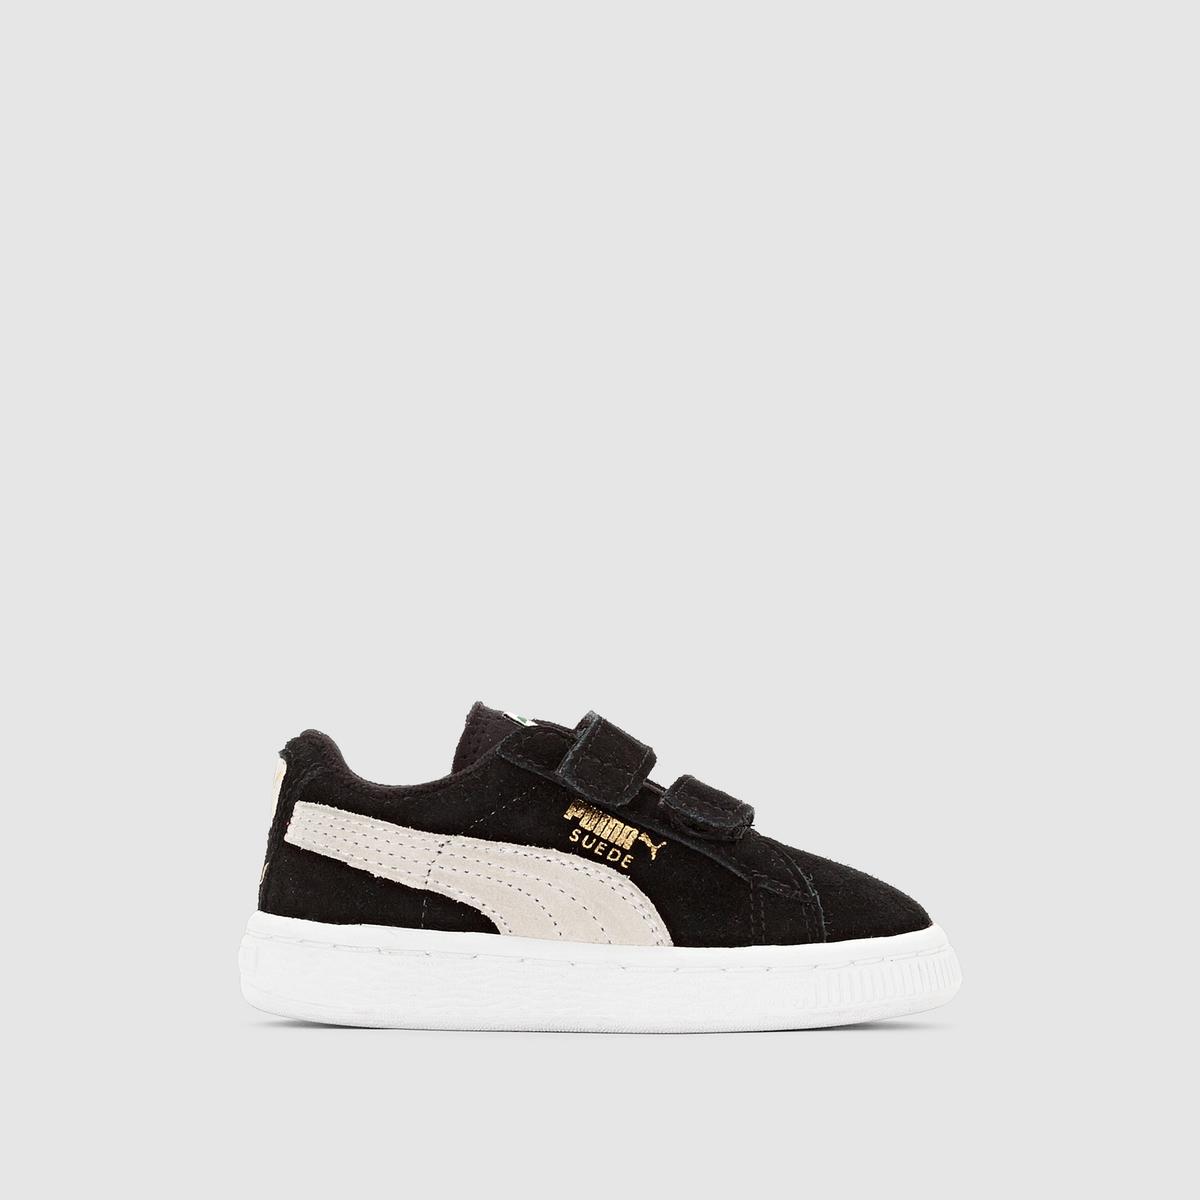 cecdd208d1e Puma Suède 2 Straps Infant sneakers zwart - Frontrunner.nl